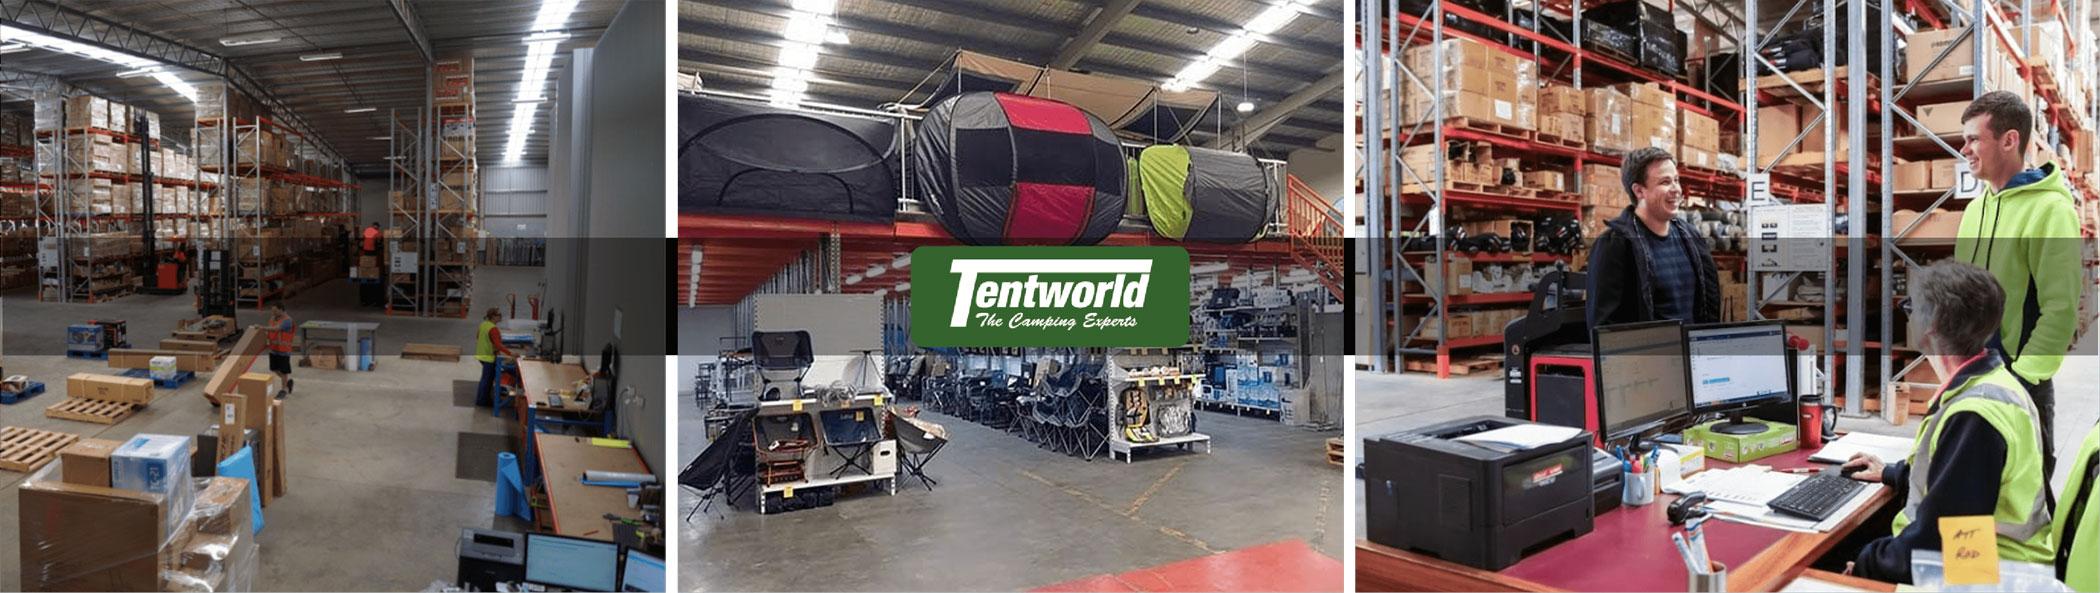 Tent World